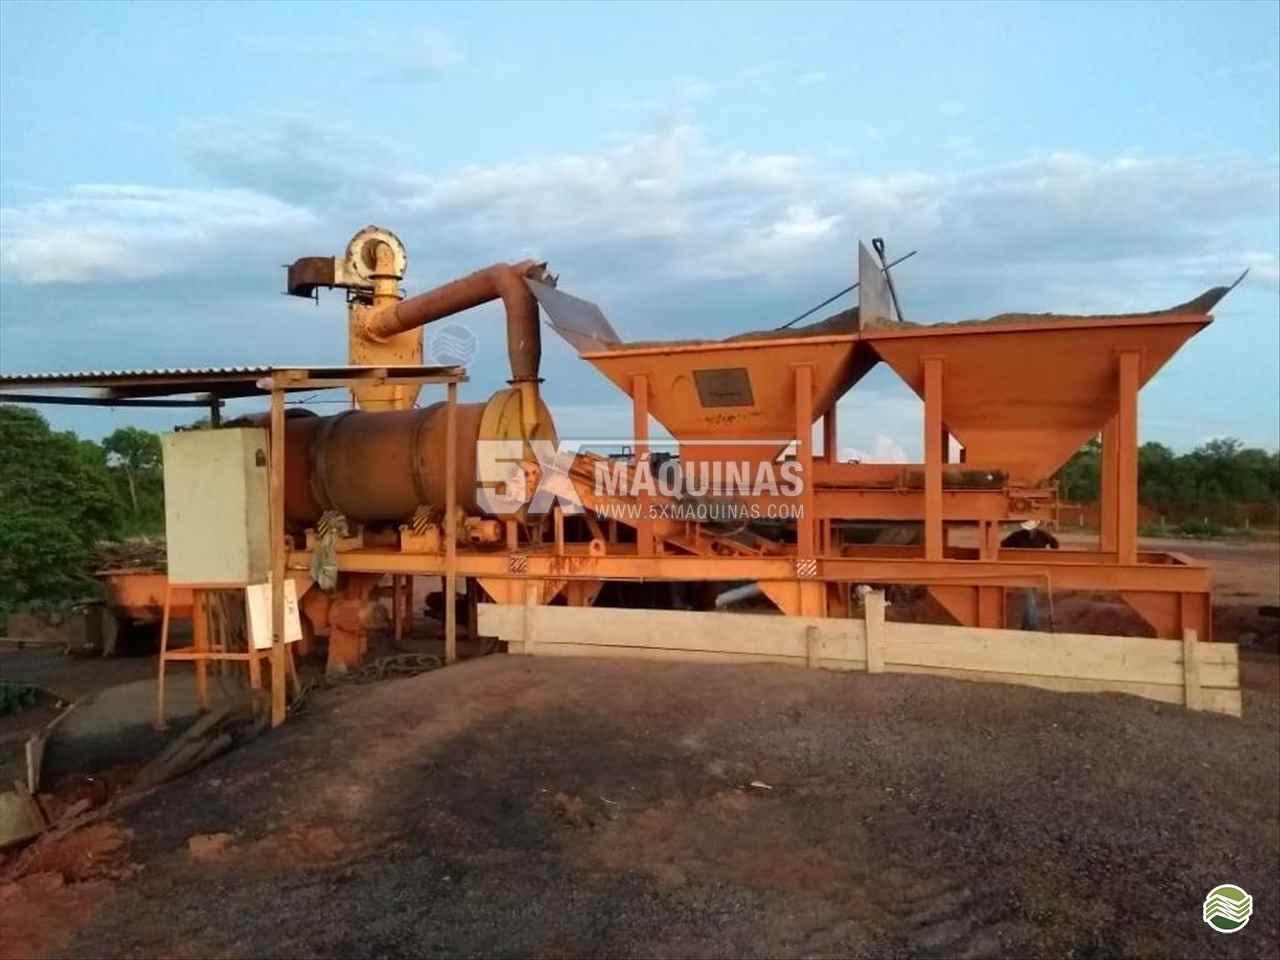 USINA ASFALTO de 5X Máquinas  - CAMPO GRANDE/MS